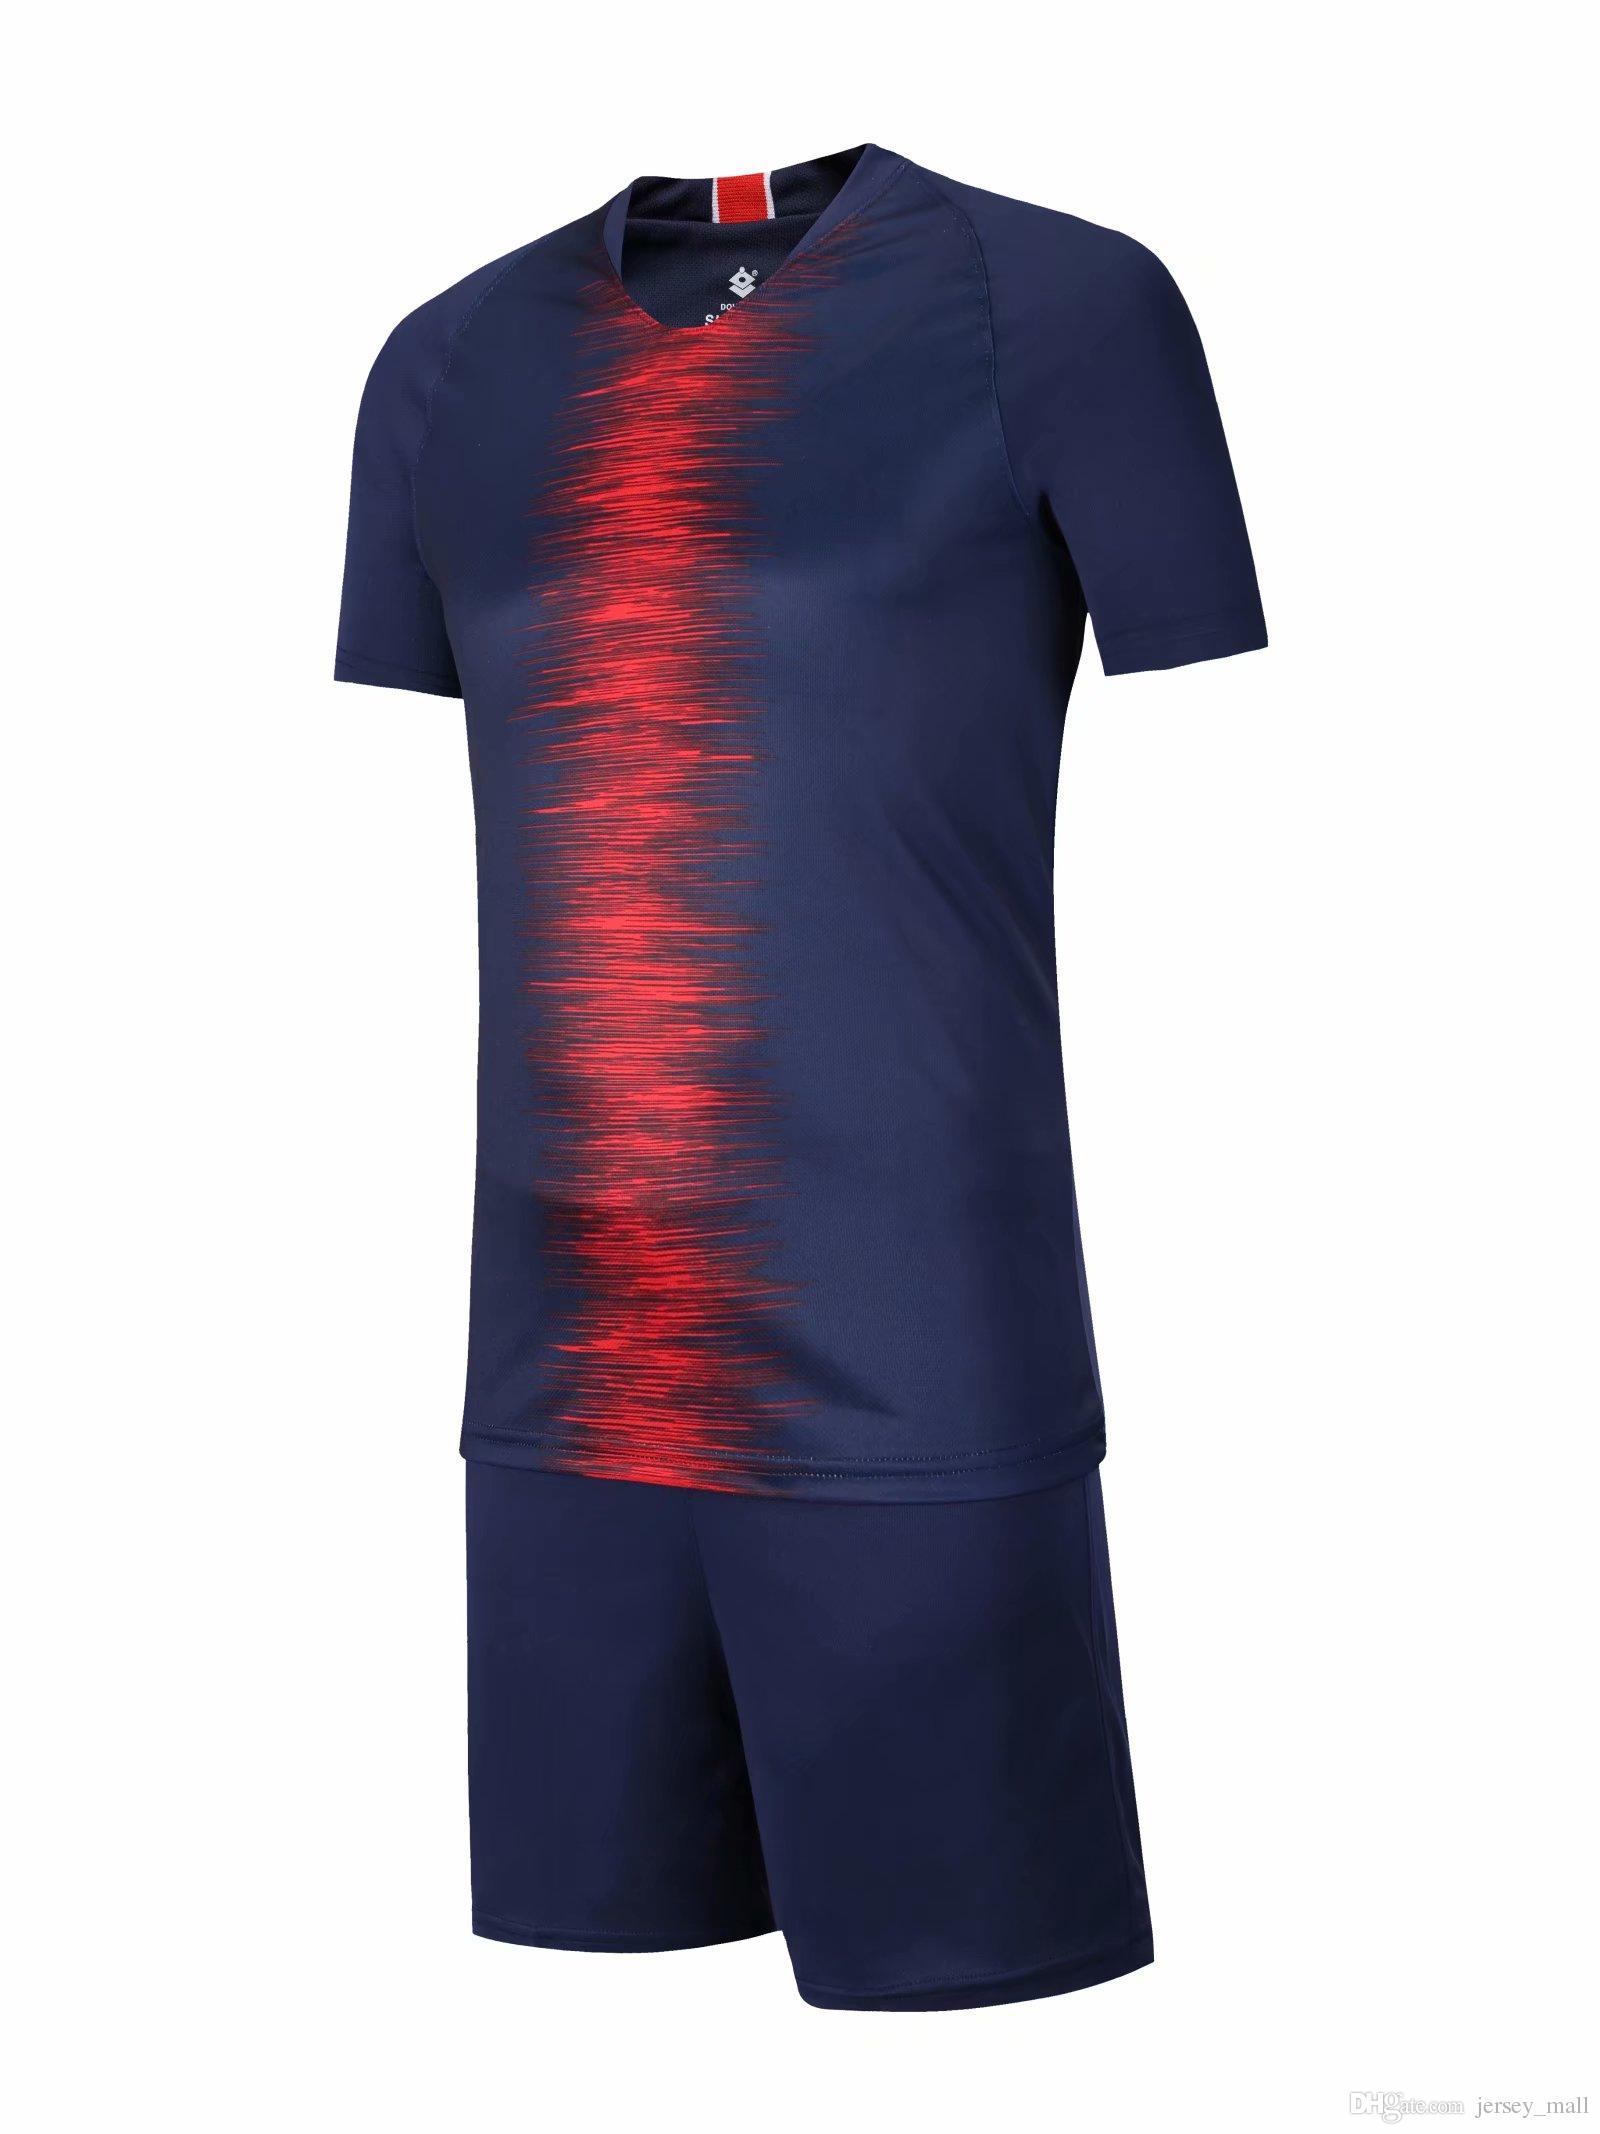 separation shoes 8aec6 e47b8 soccer jersey kit wholesale football tshirt shorts pants uniform set / men  s sport articles jersey S M L XL Discount Sale [Free shipping]